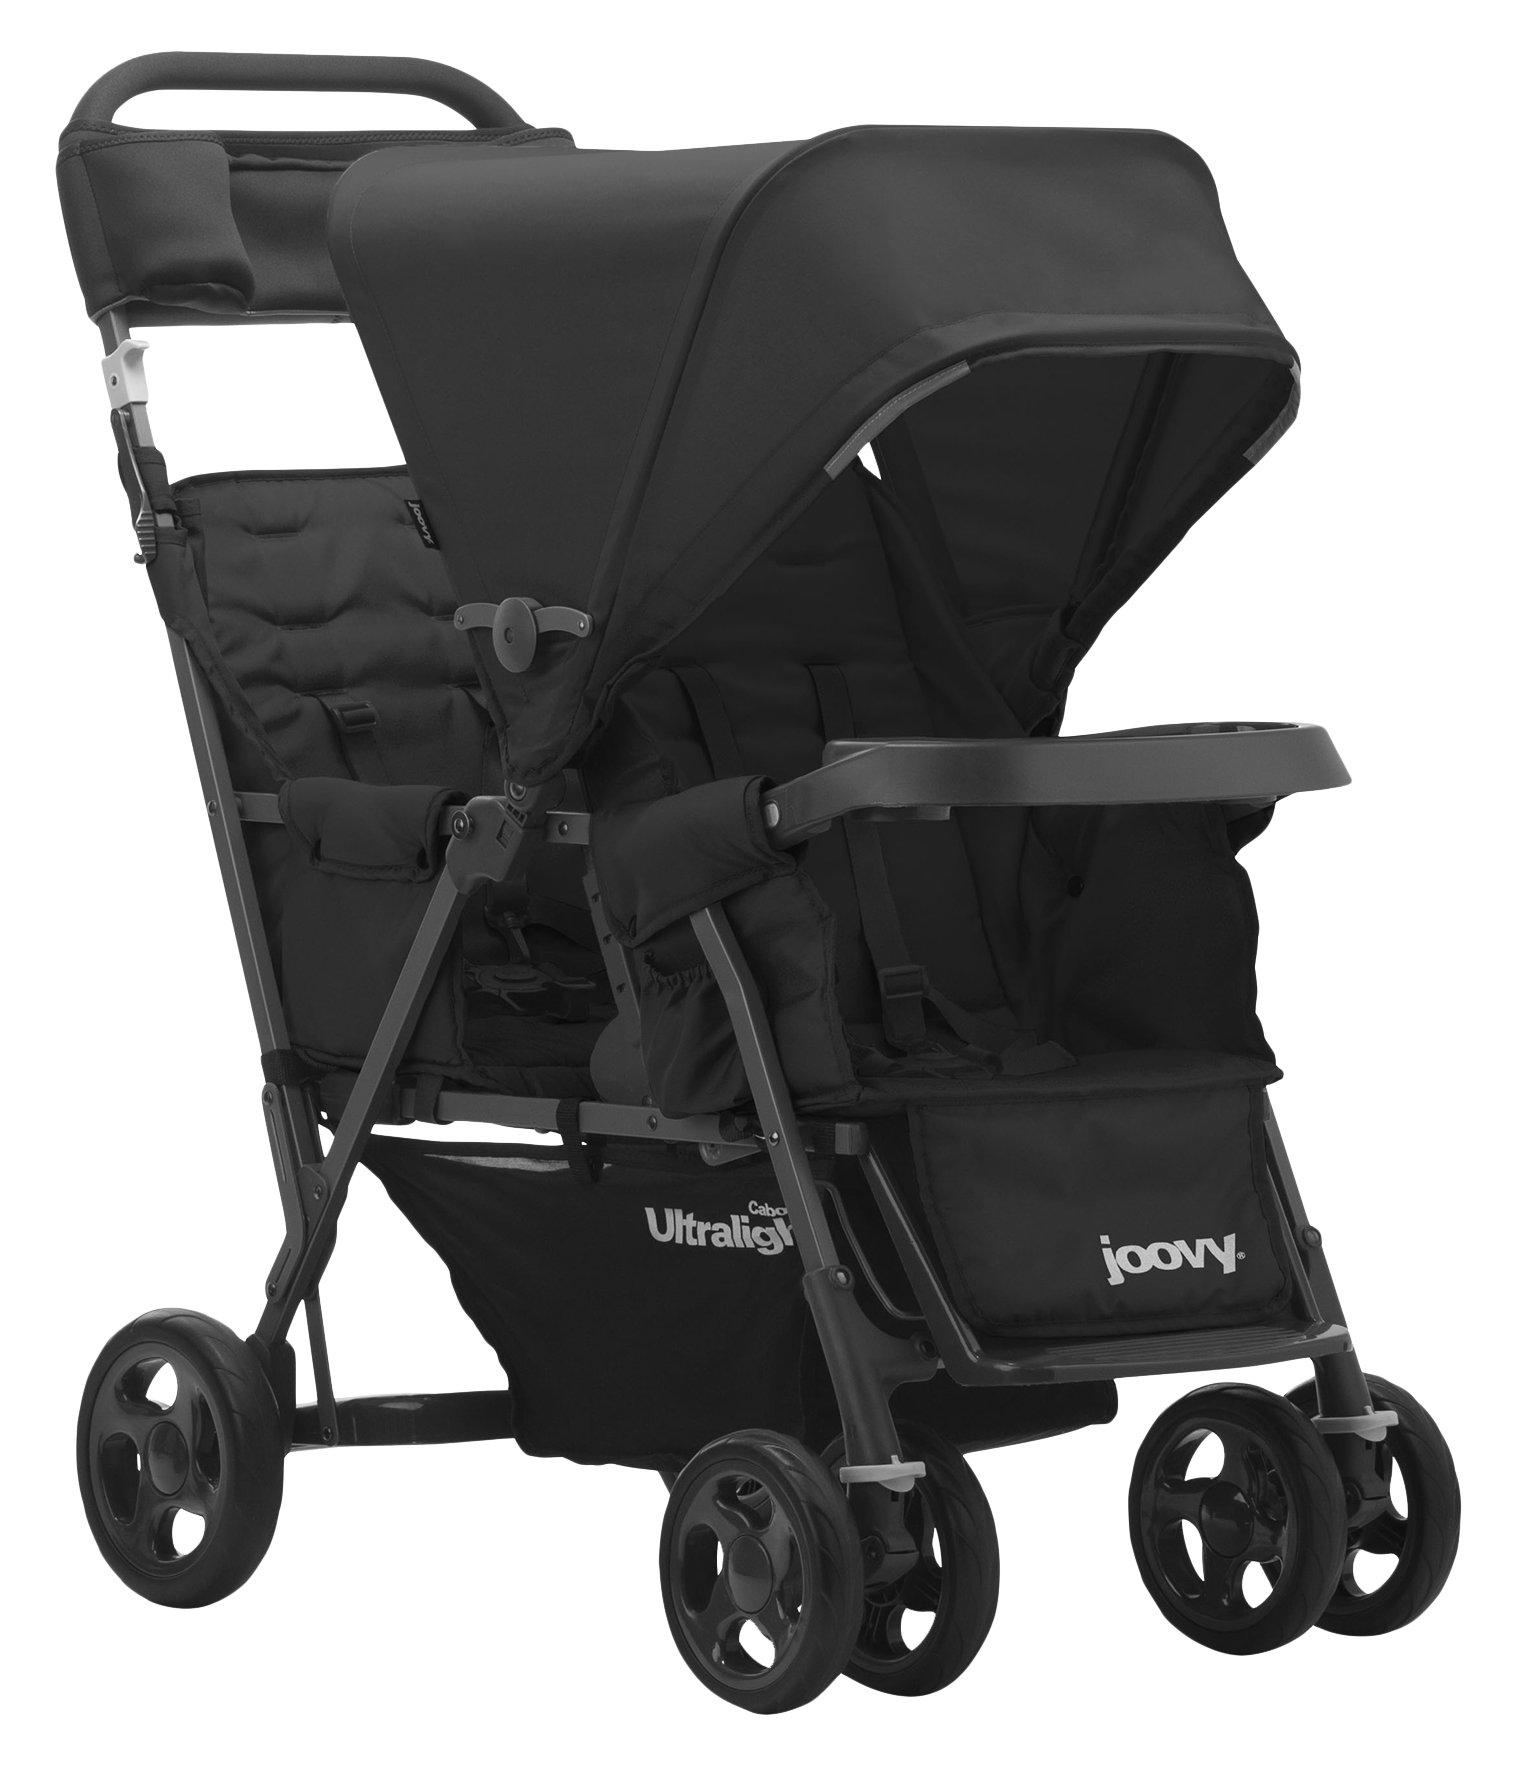 JOOVY Caboose Too Ultralight Graphite Stand-On Tandem Stroller, Black by Joovy